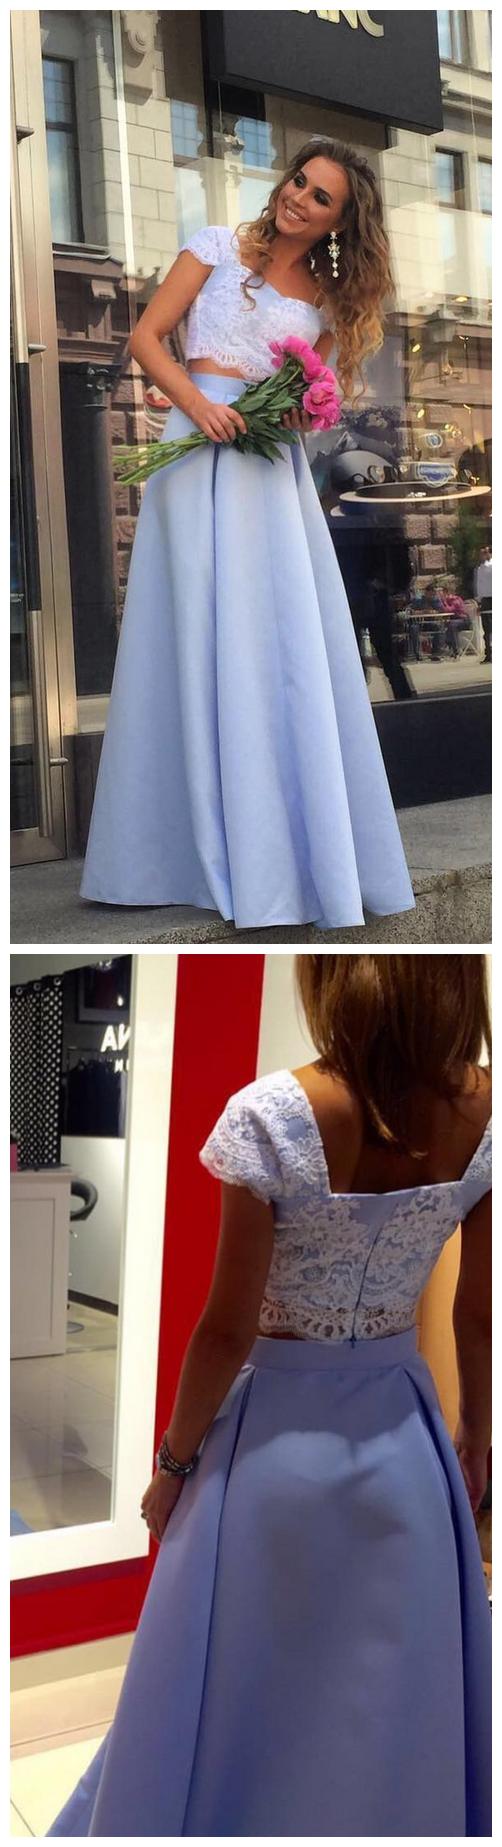 Charming Lace Prom Dress, Sexy Blue Prom Dress, Short Sleeve Long Evening Dress